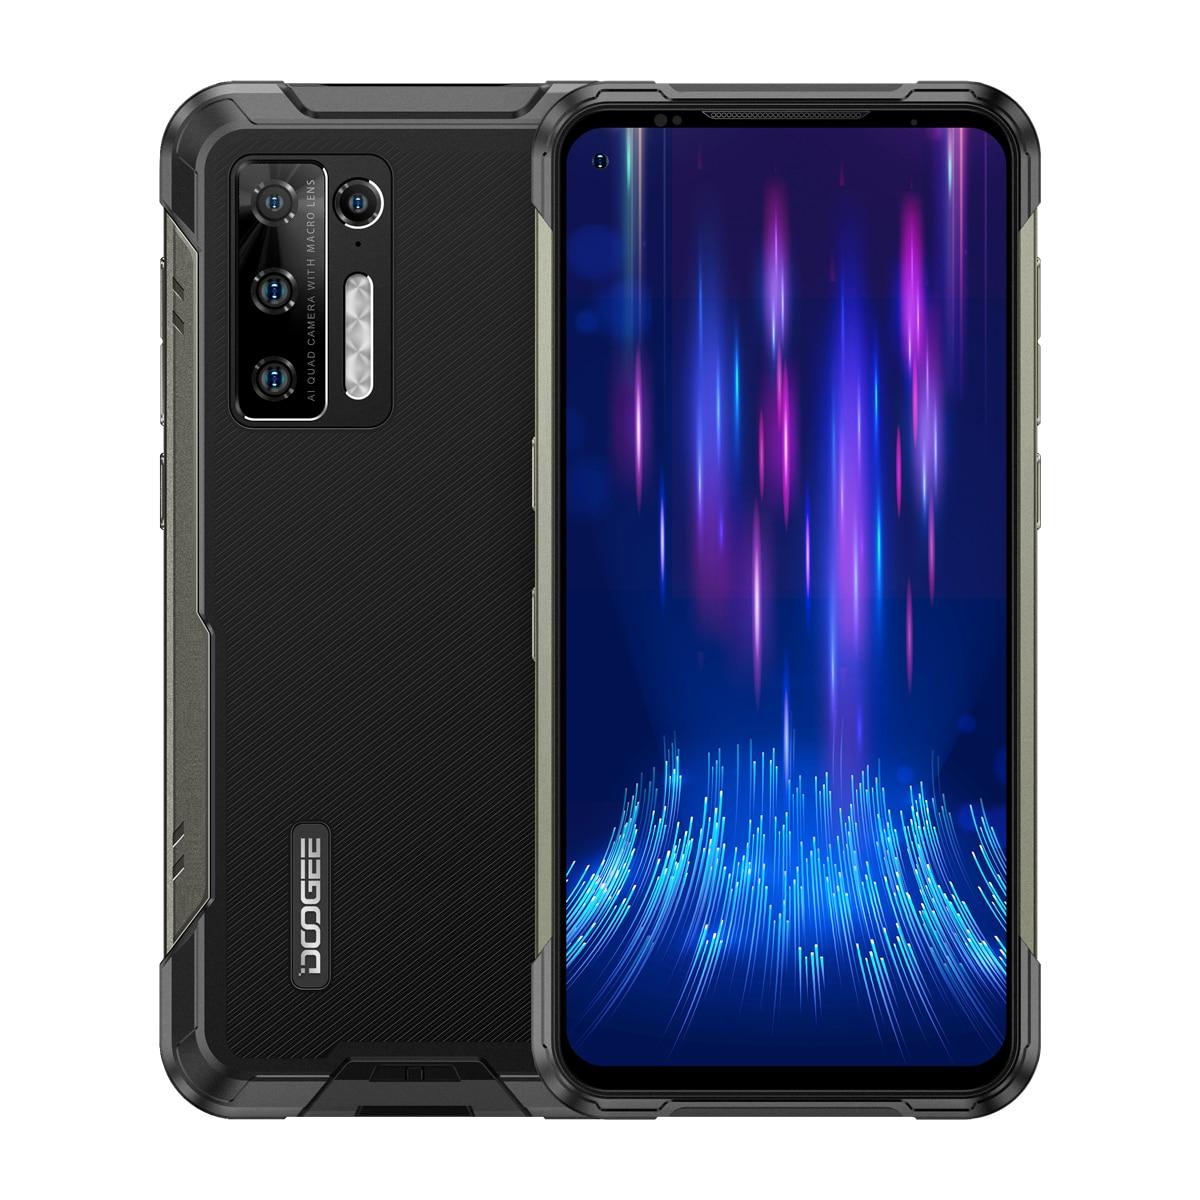 DOOGEE S97 Pro IP68 Водонепроницаемый мобильного телефона 40m Лазерный диапазон 8 ГБ + 128 ГБ 48MP Helio G95 8500 мАч Android 11 NFC 4 аппарат не привязан к оператору со...